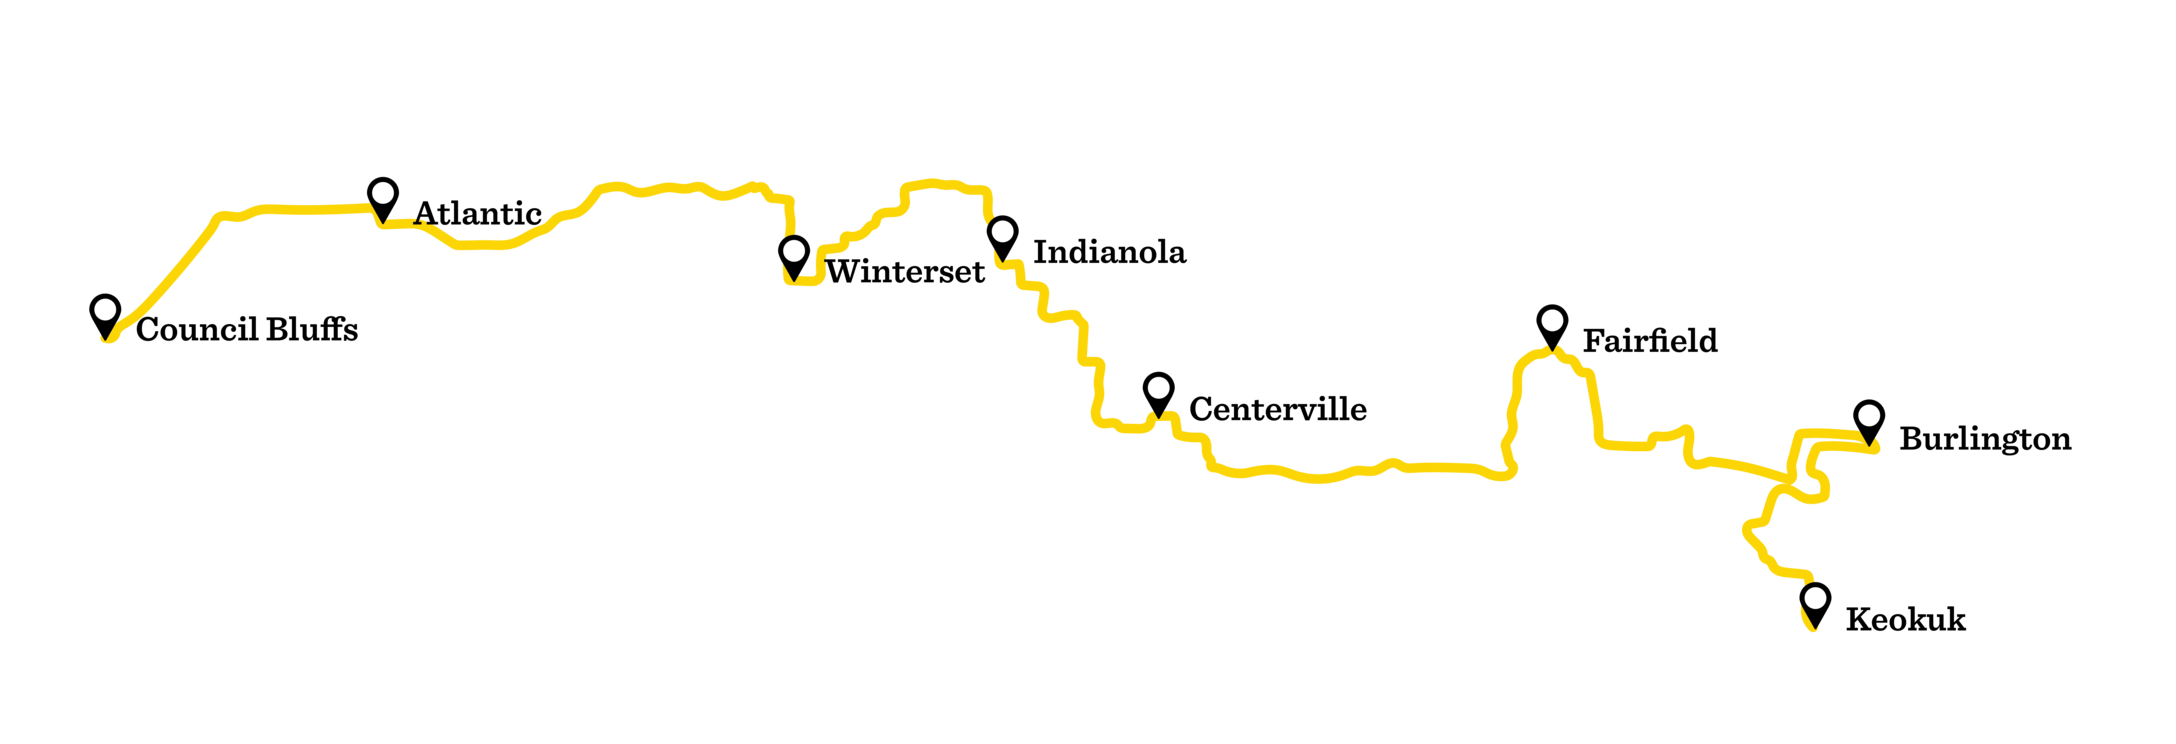 RAGBRAI route of 2019